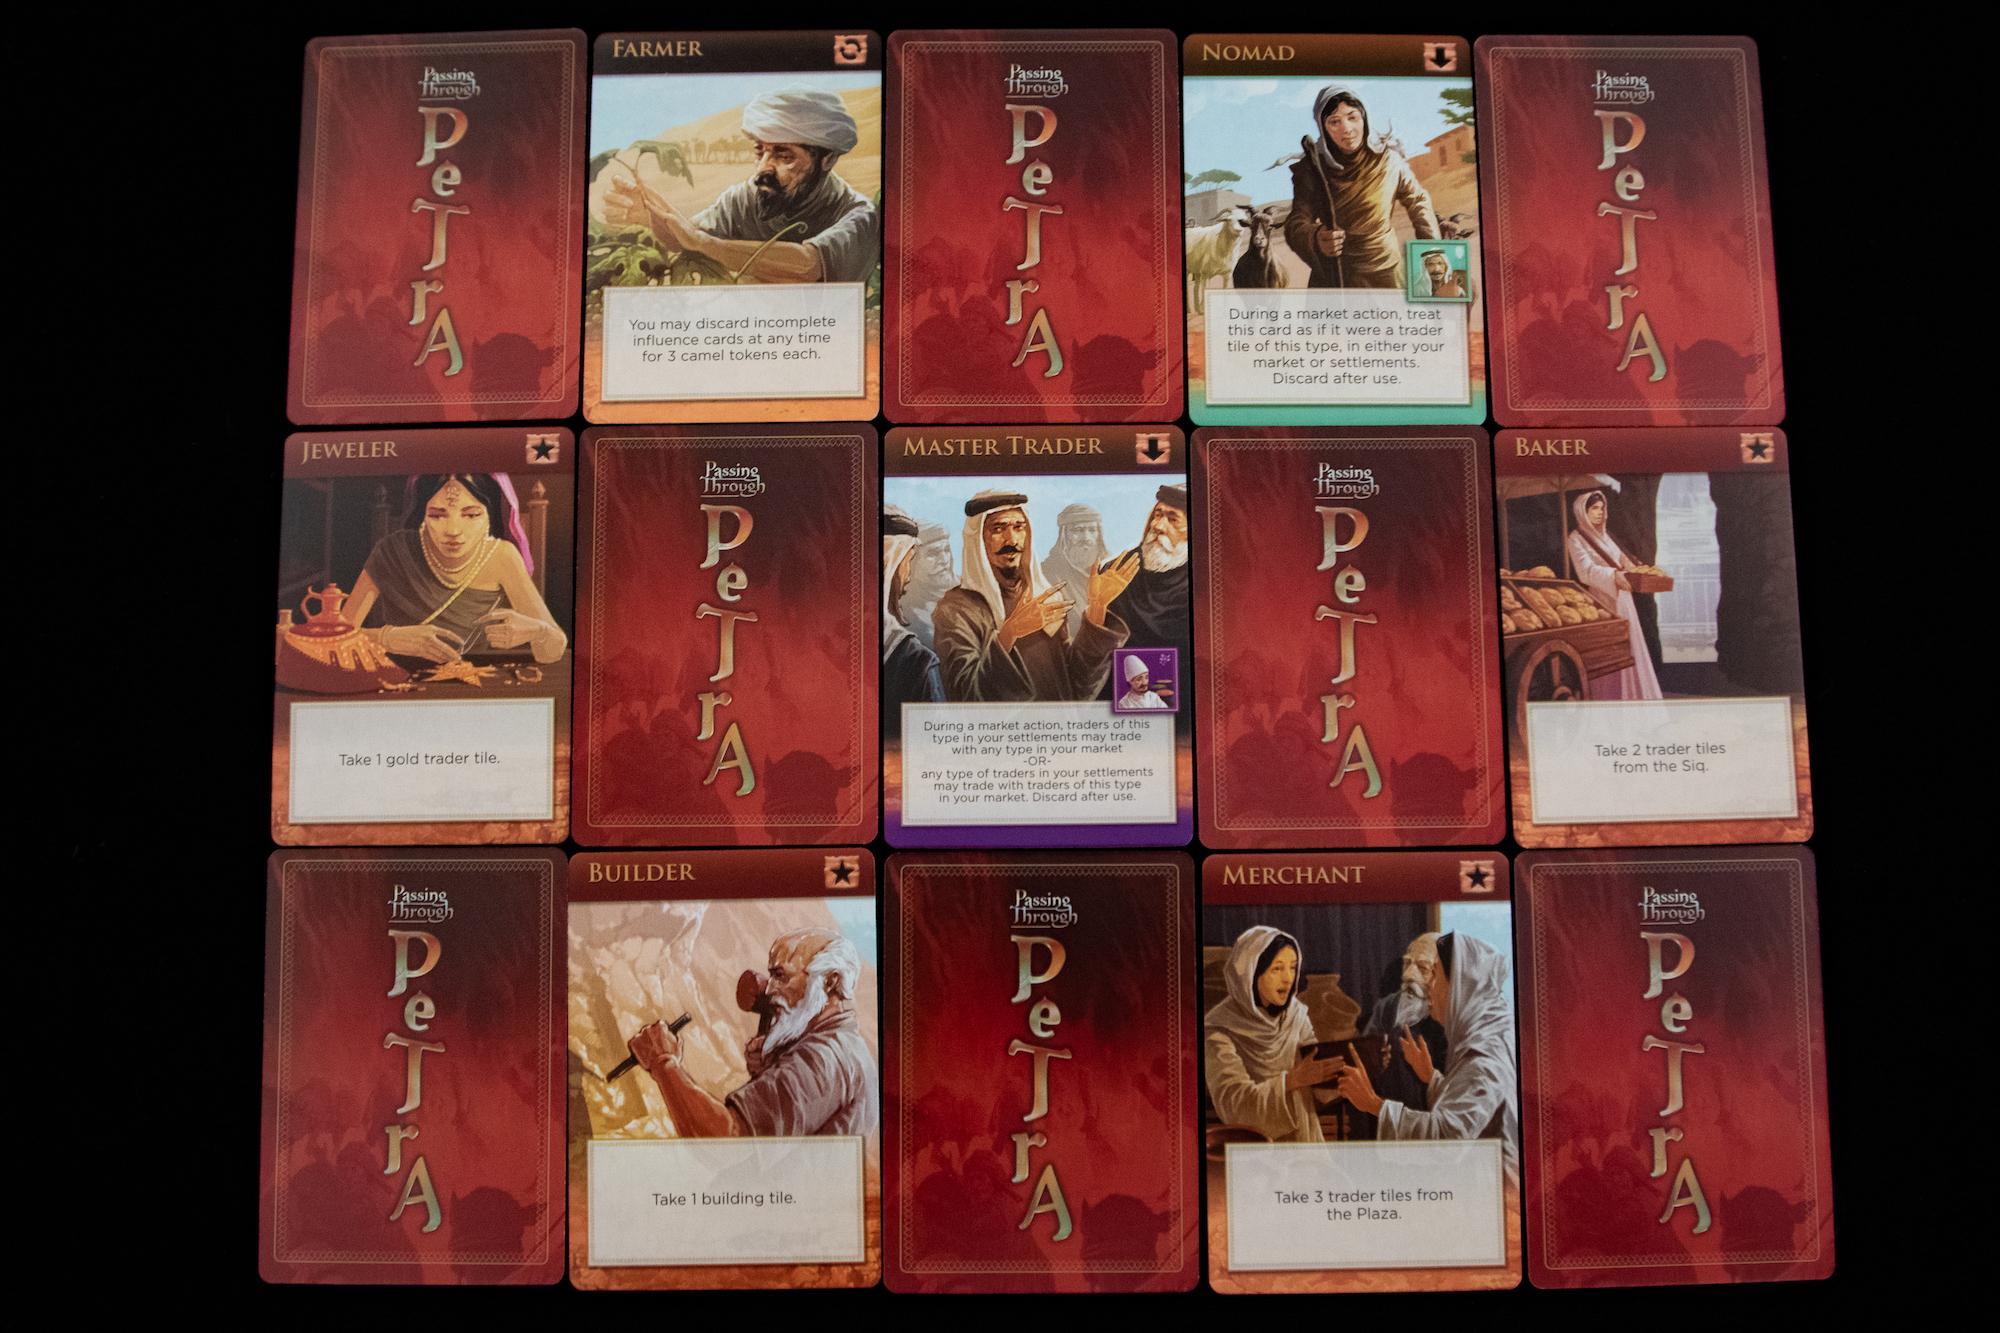 Passing_Through_Petra (16 of 16).jpg